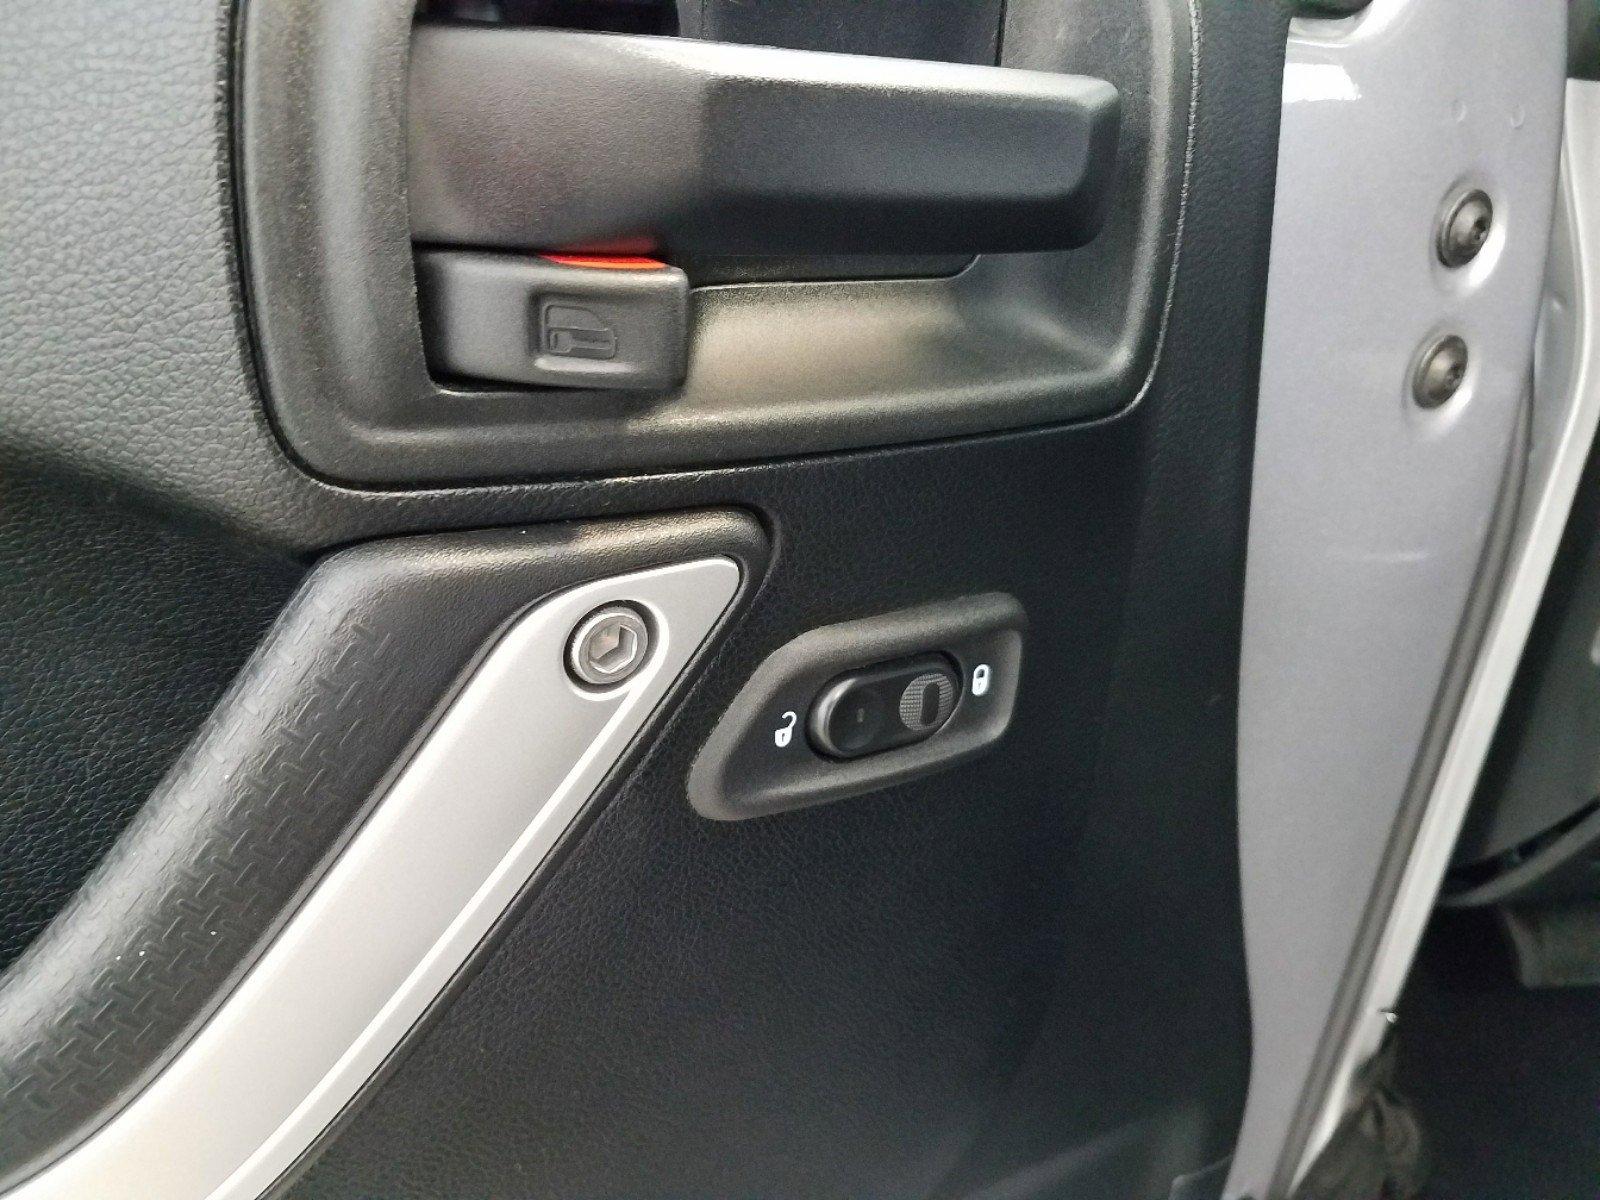 Pre-Owned 2018 Jeep Wrangler JK Unlimited Sahara